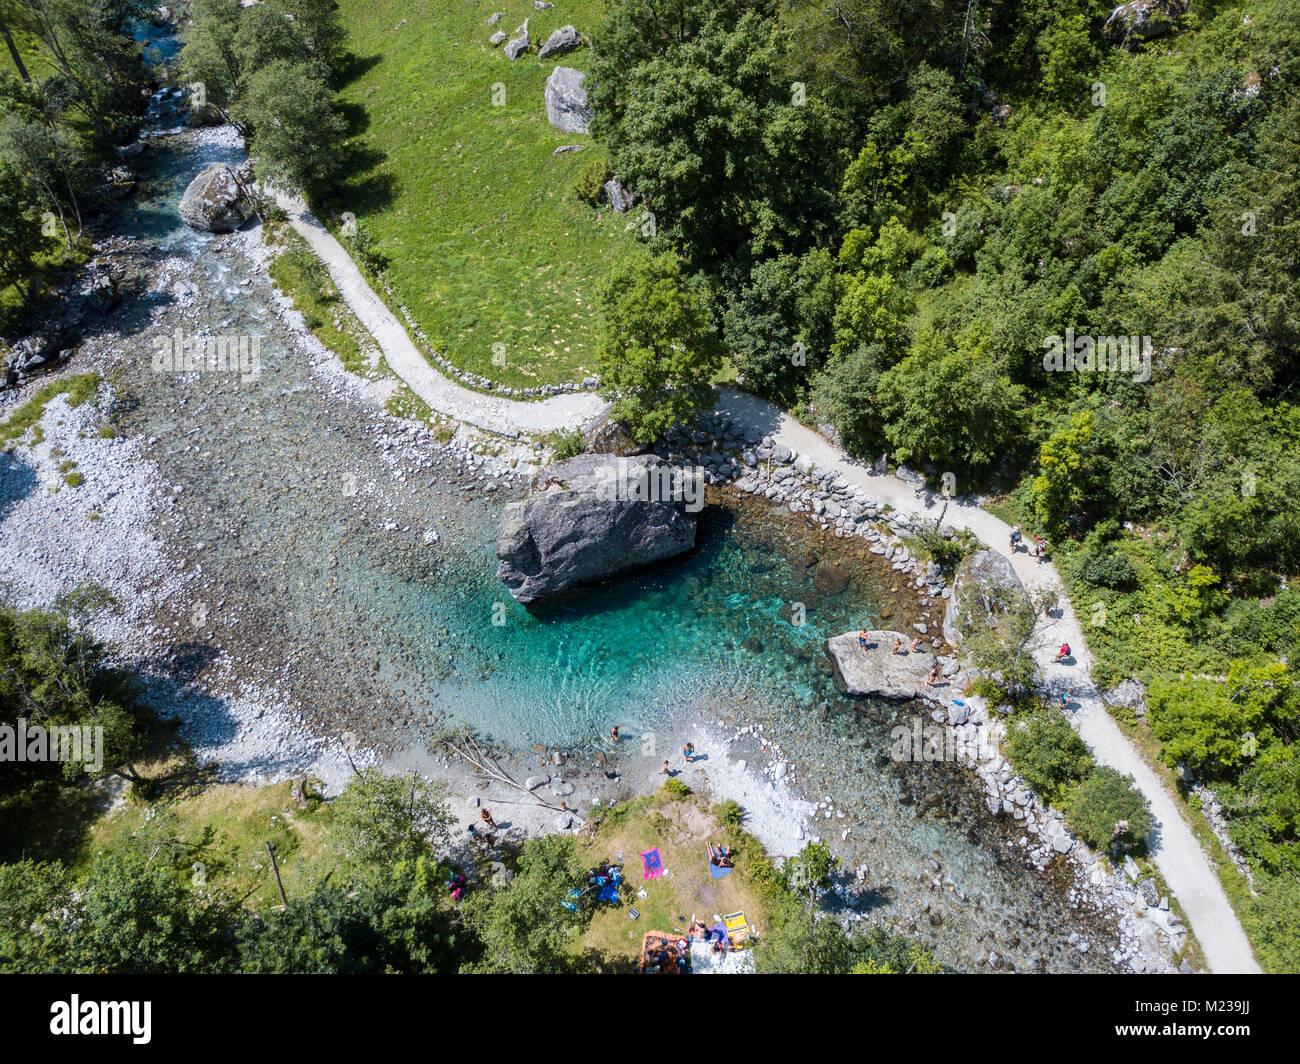 Aerial View Of The Giant Rock Called The Bidet Della Contessa In